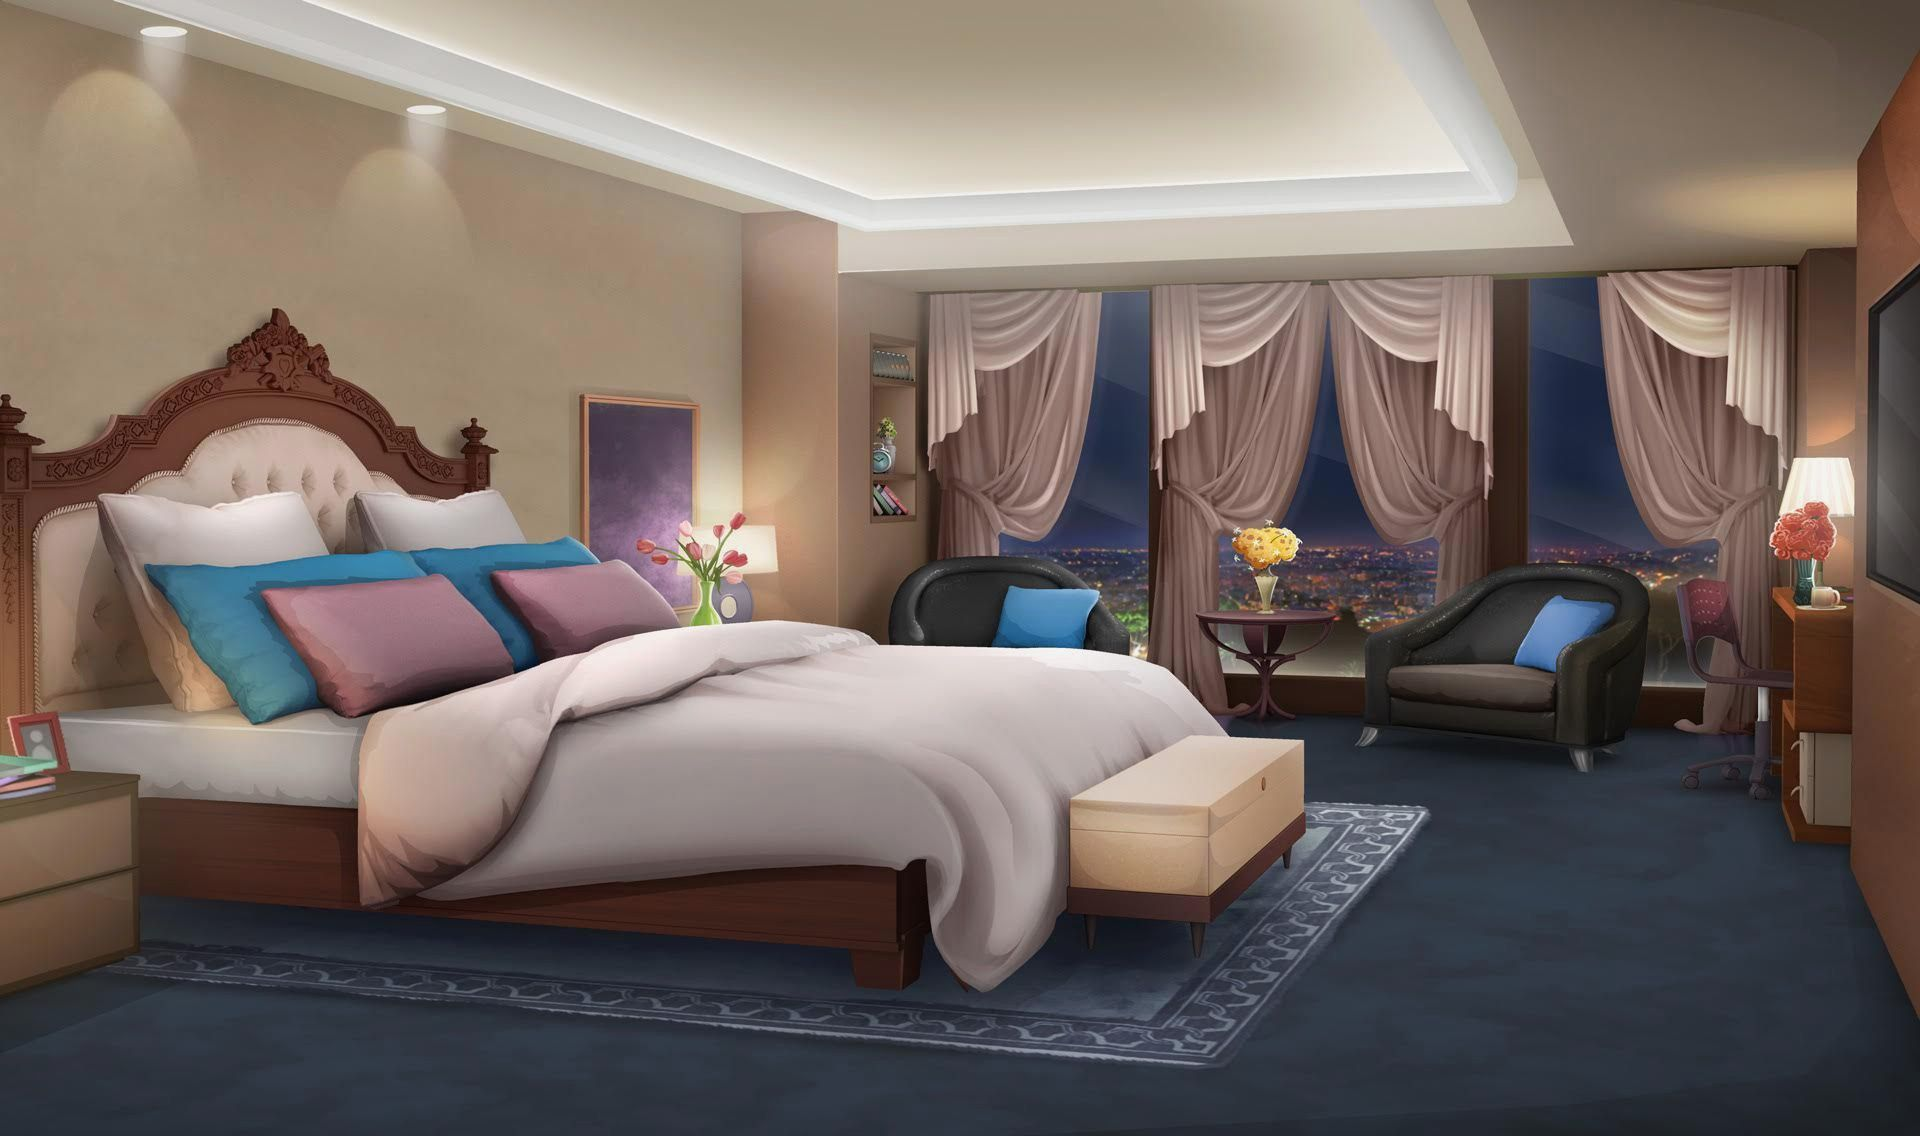 Anime Schlafzimmer Dekor Episode Interactive Backgrounds